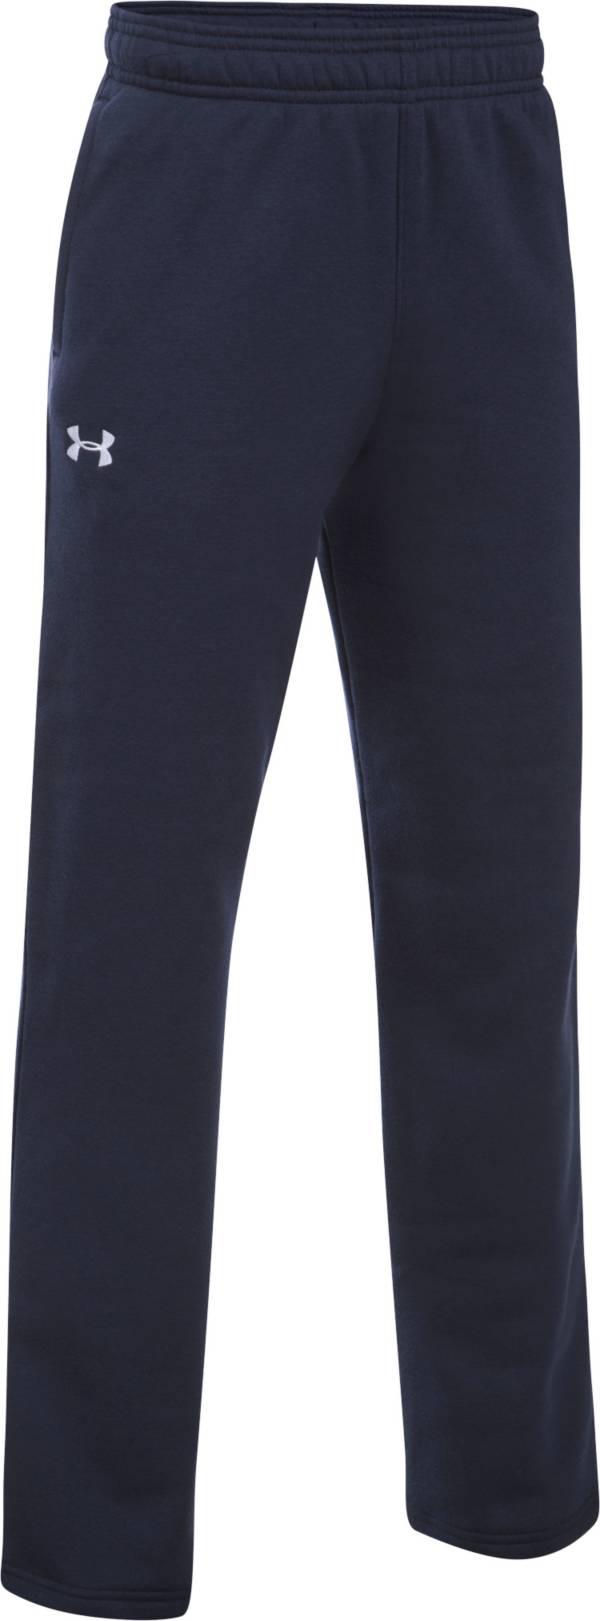 Under Armour Boys' Hustle Fleece Pants product image